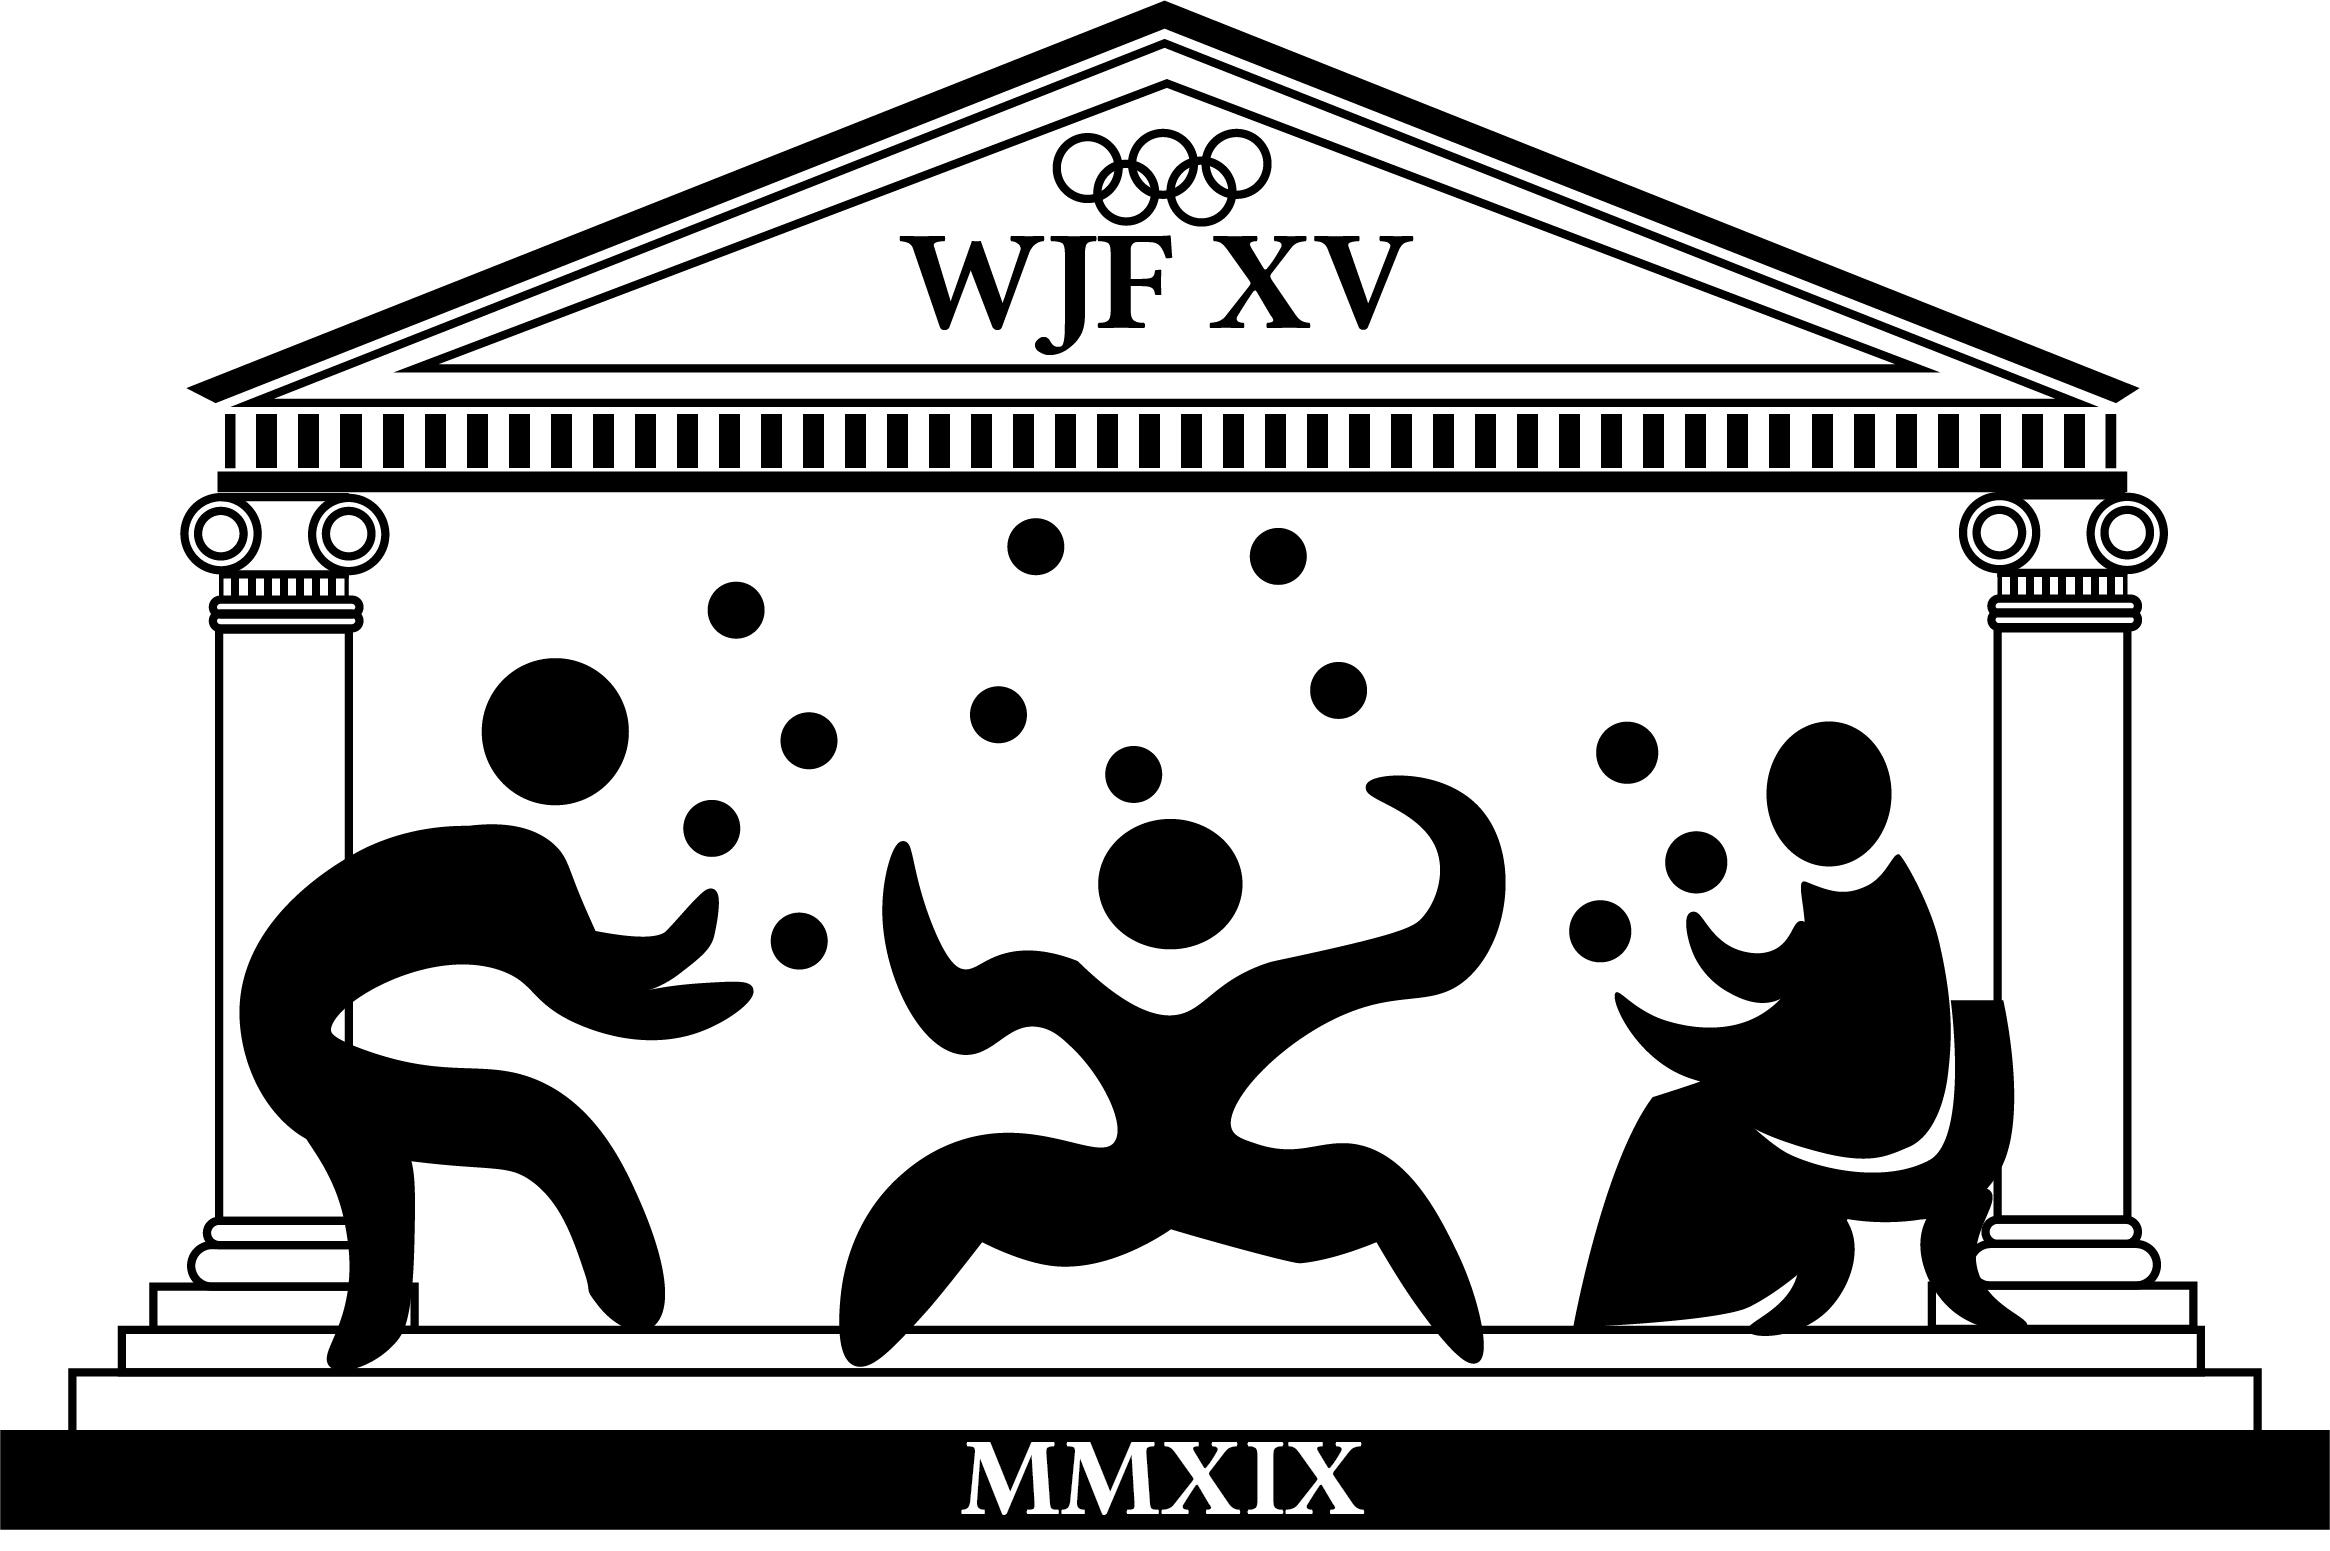 WJF15_2019_oops_Flat